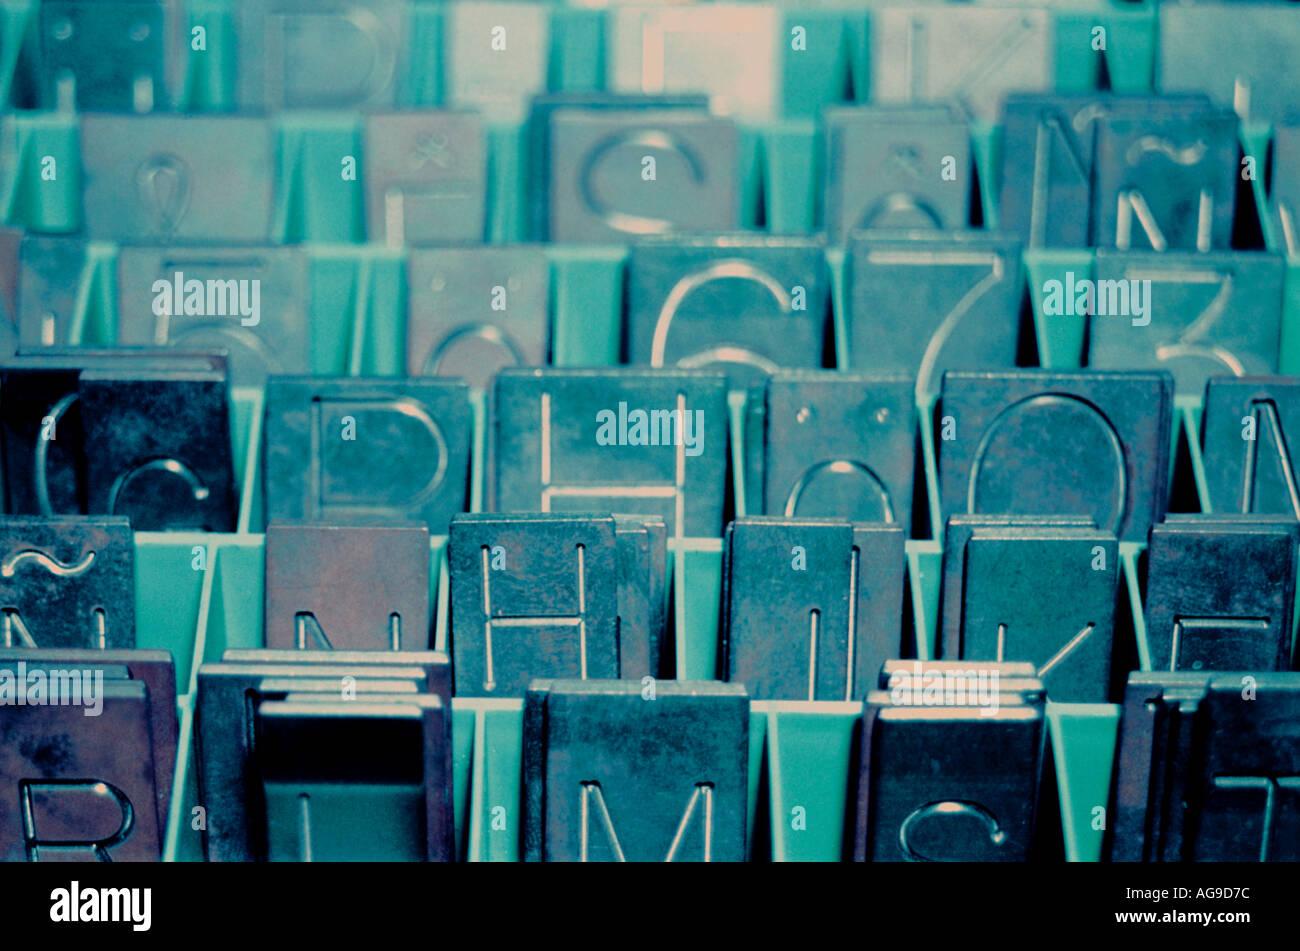 engraving alphabet plates Stock Photo